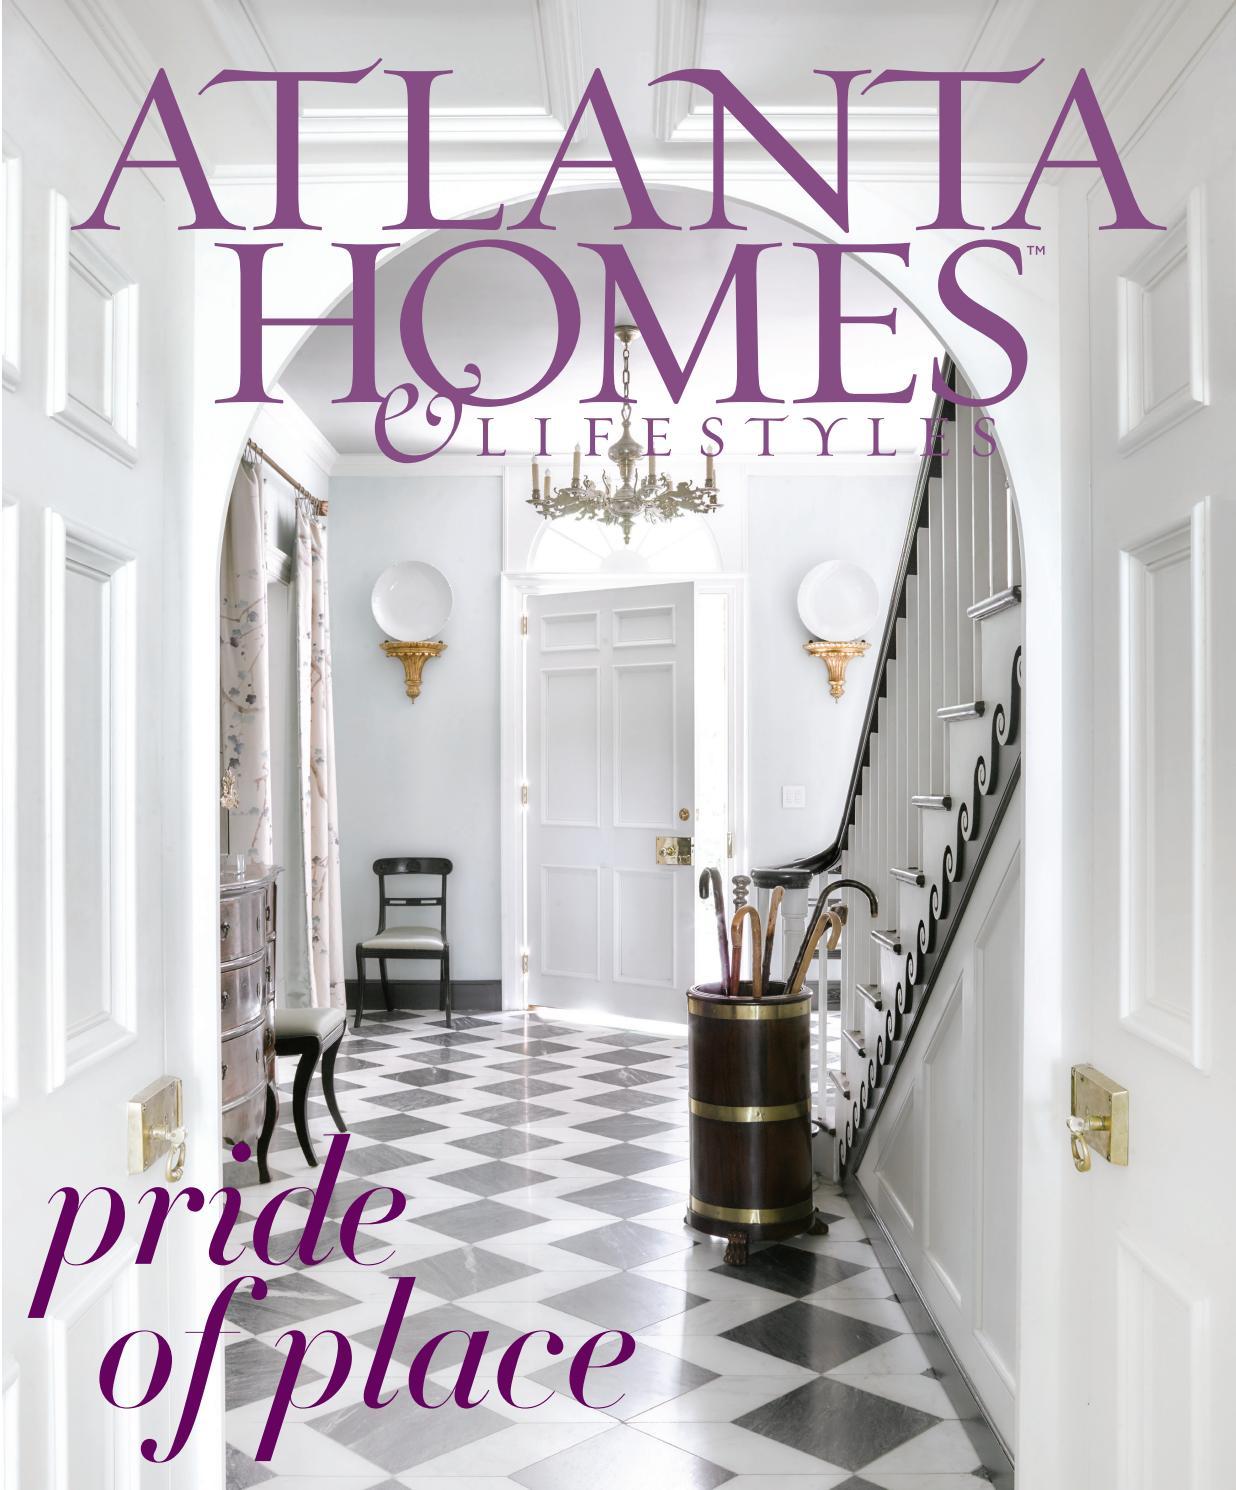 September 2017 By Atlanta Homes Lifestyles Issuu